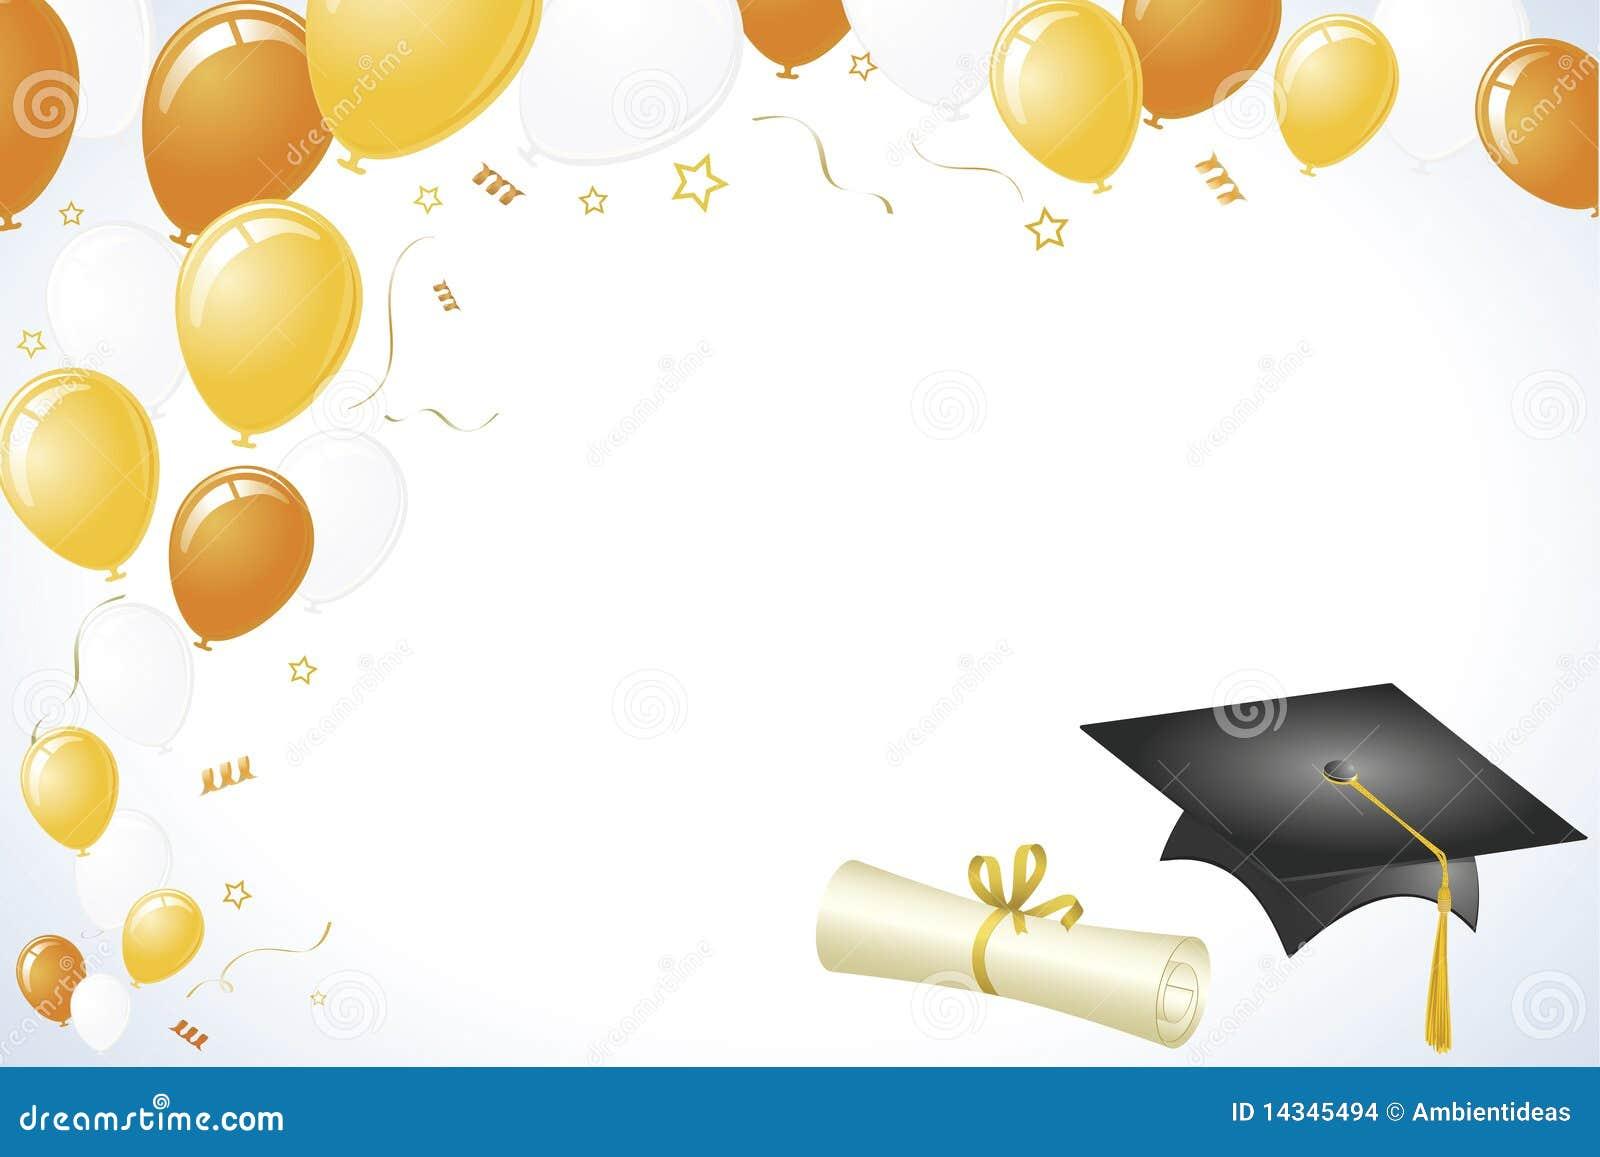 Blue and Gold Graduation Wallpaper